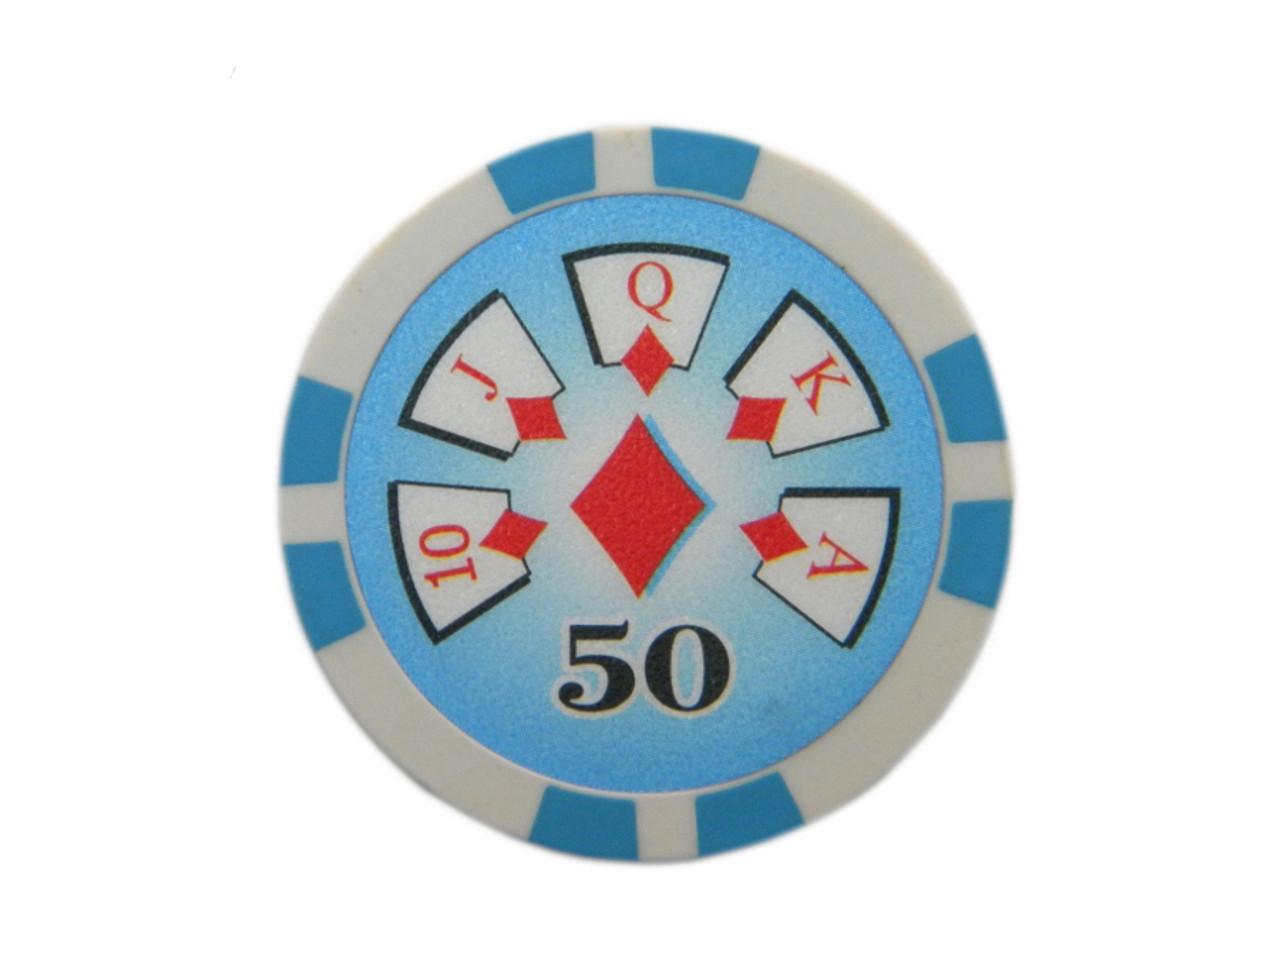 Fisic 25 jetoane Royal Flush - Albastre - Valoare printata : 50